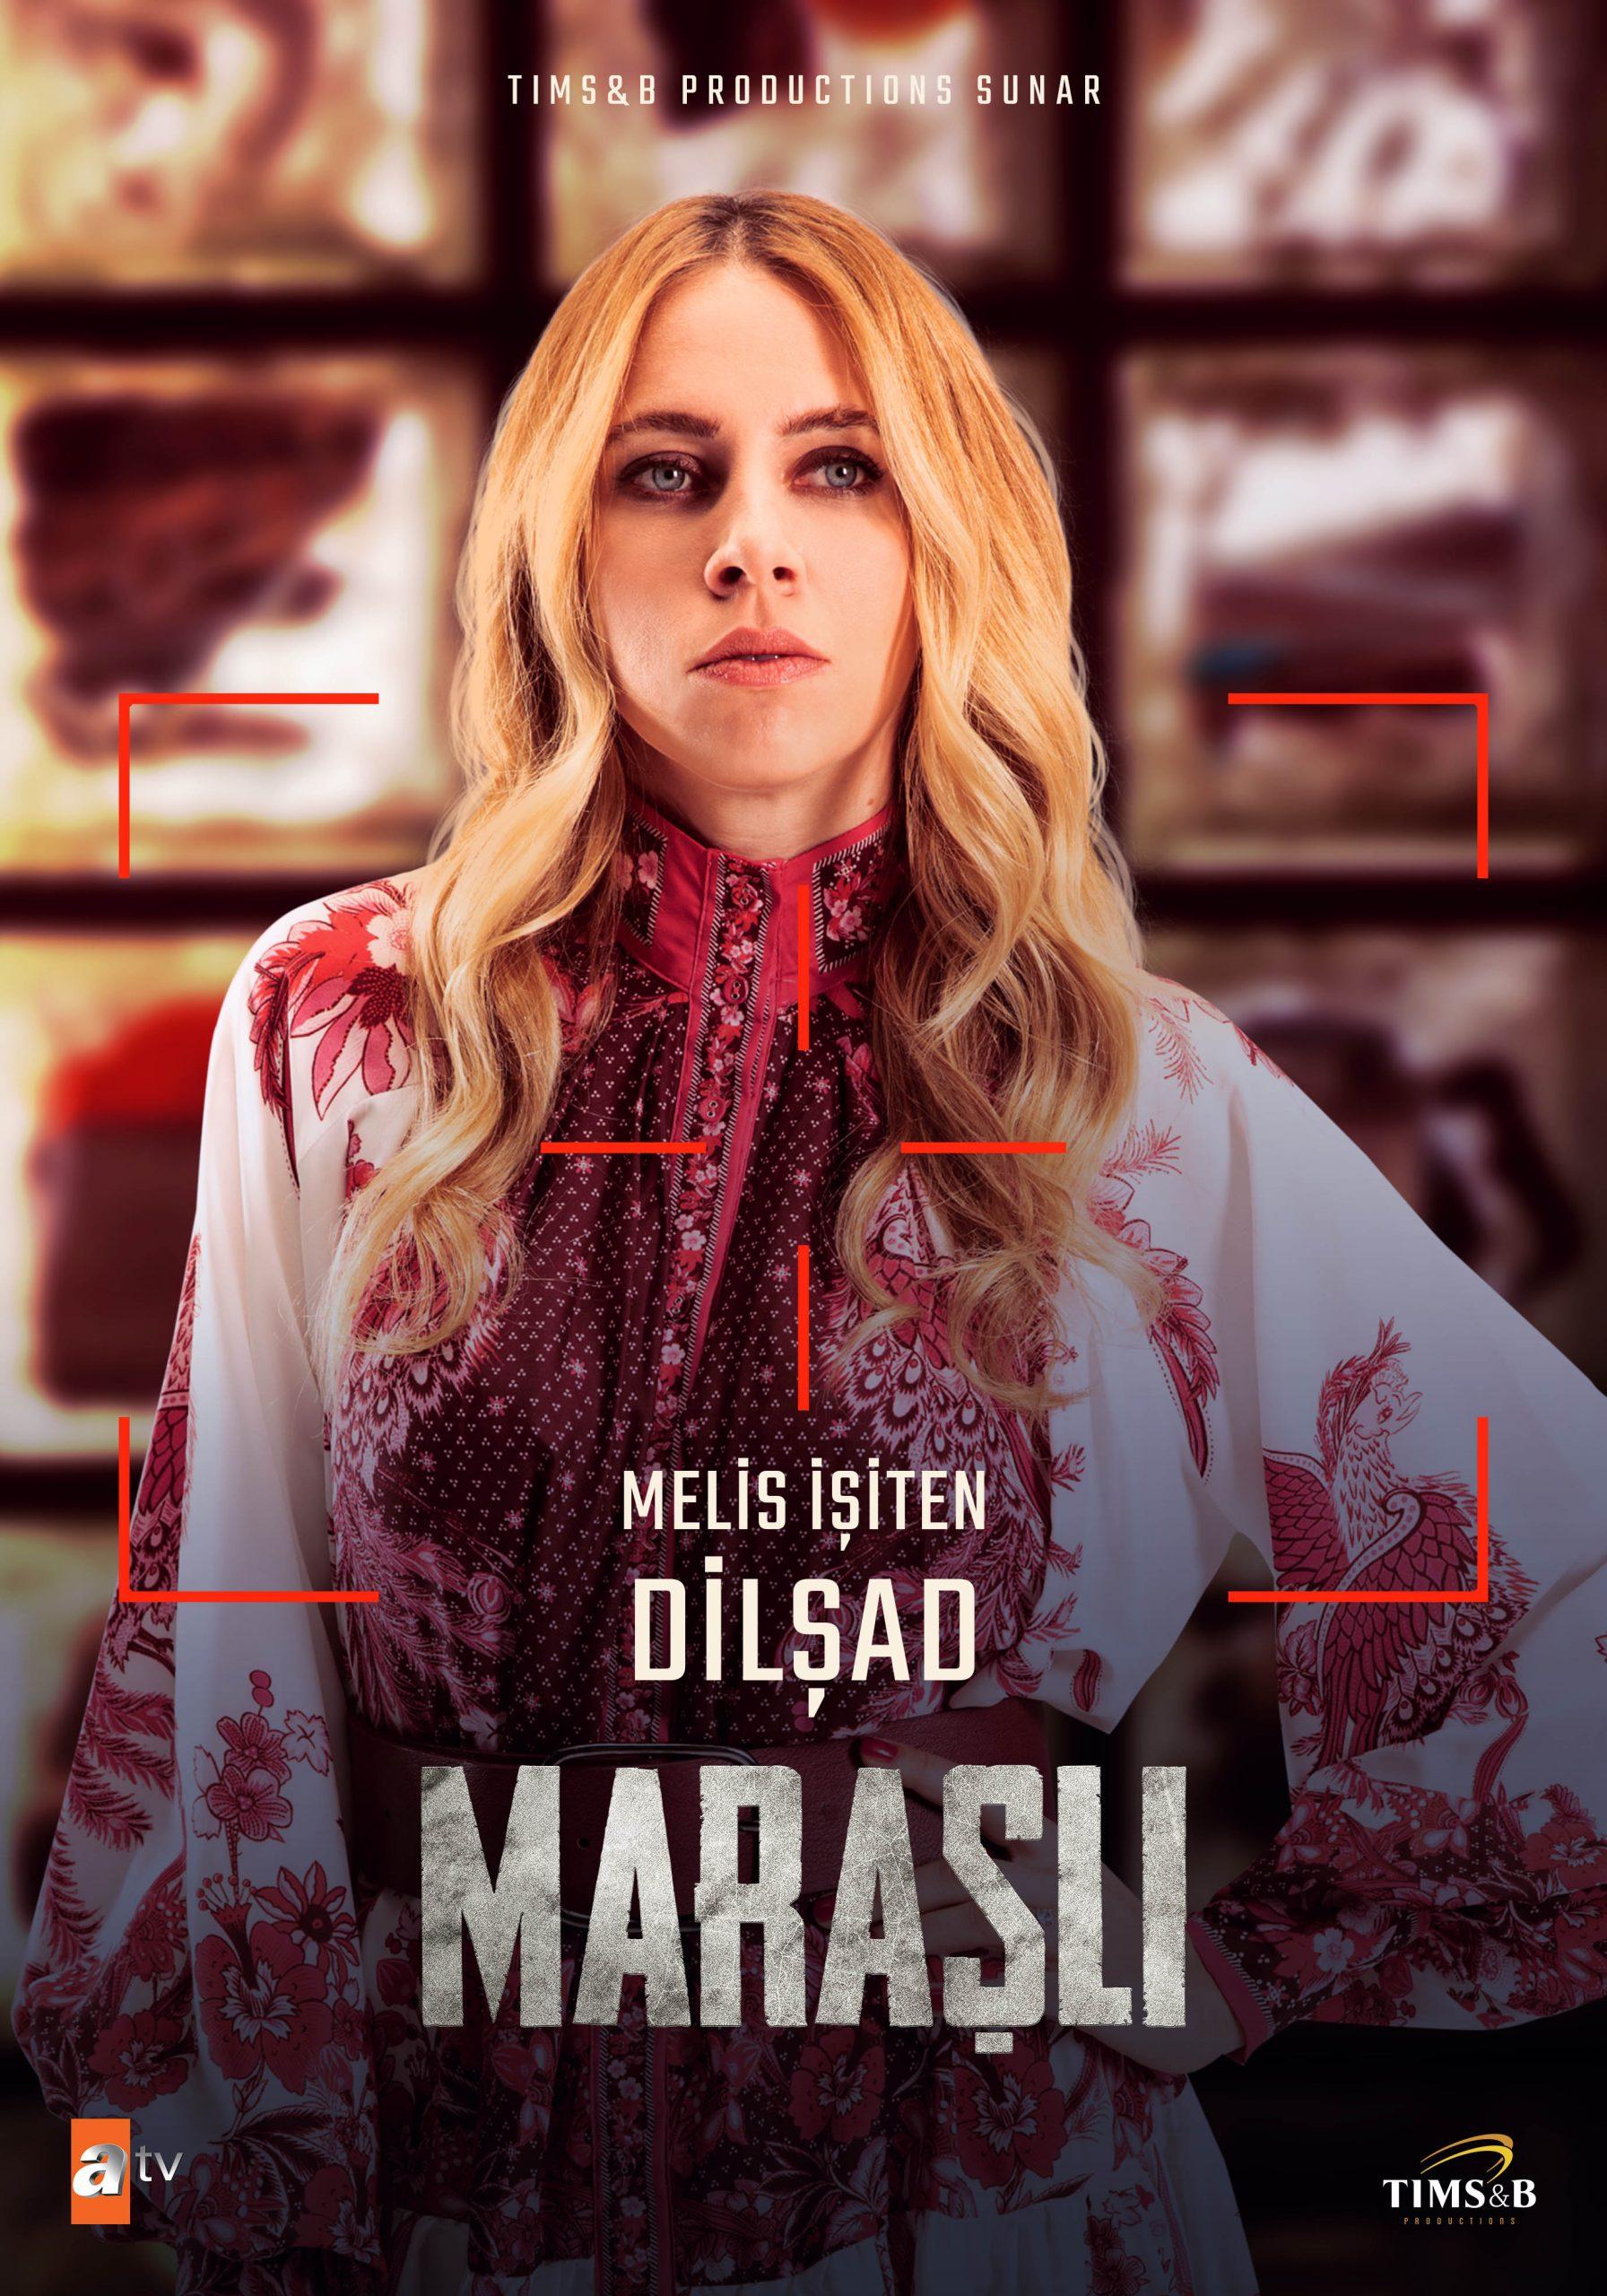 MARASLI_KARAKTER_DILSAD_M-scaled